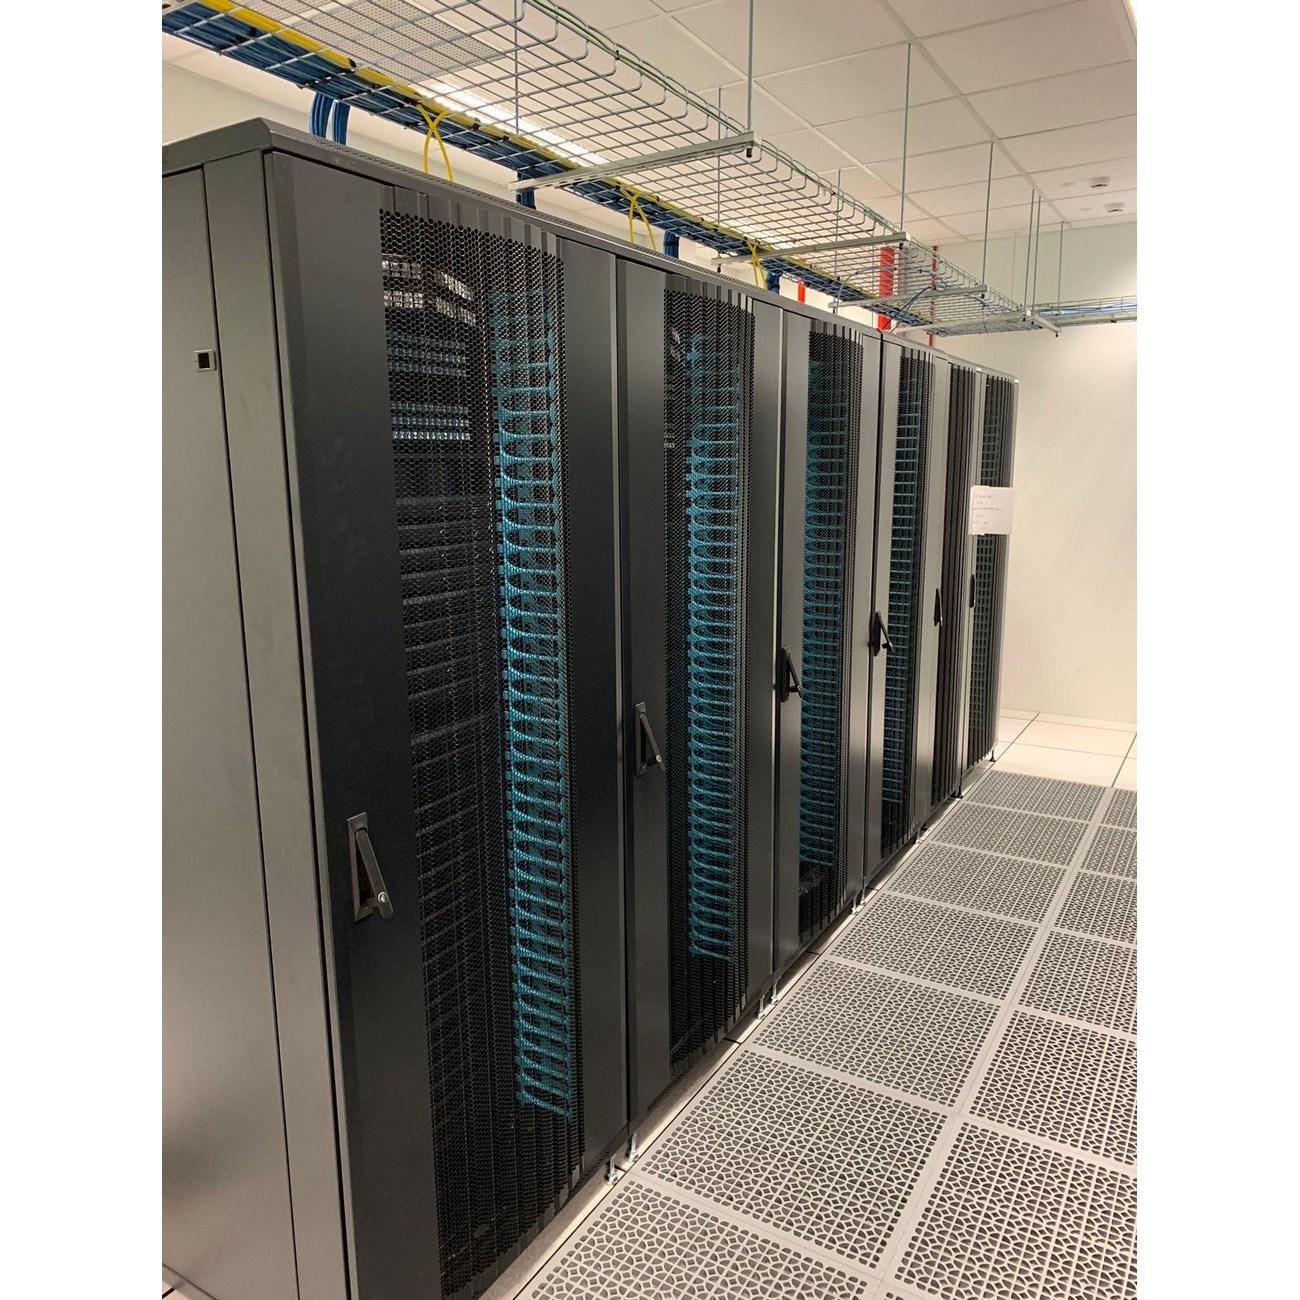 Fiber Optics & Structure Cabling (5)